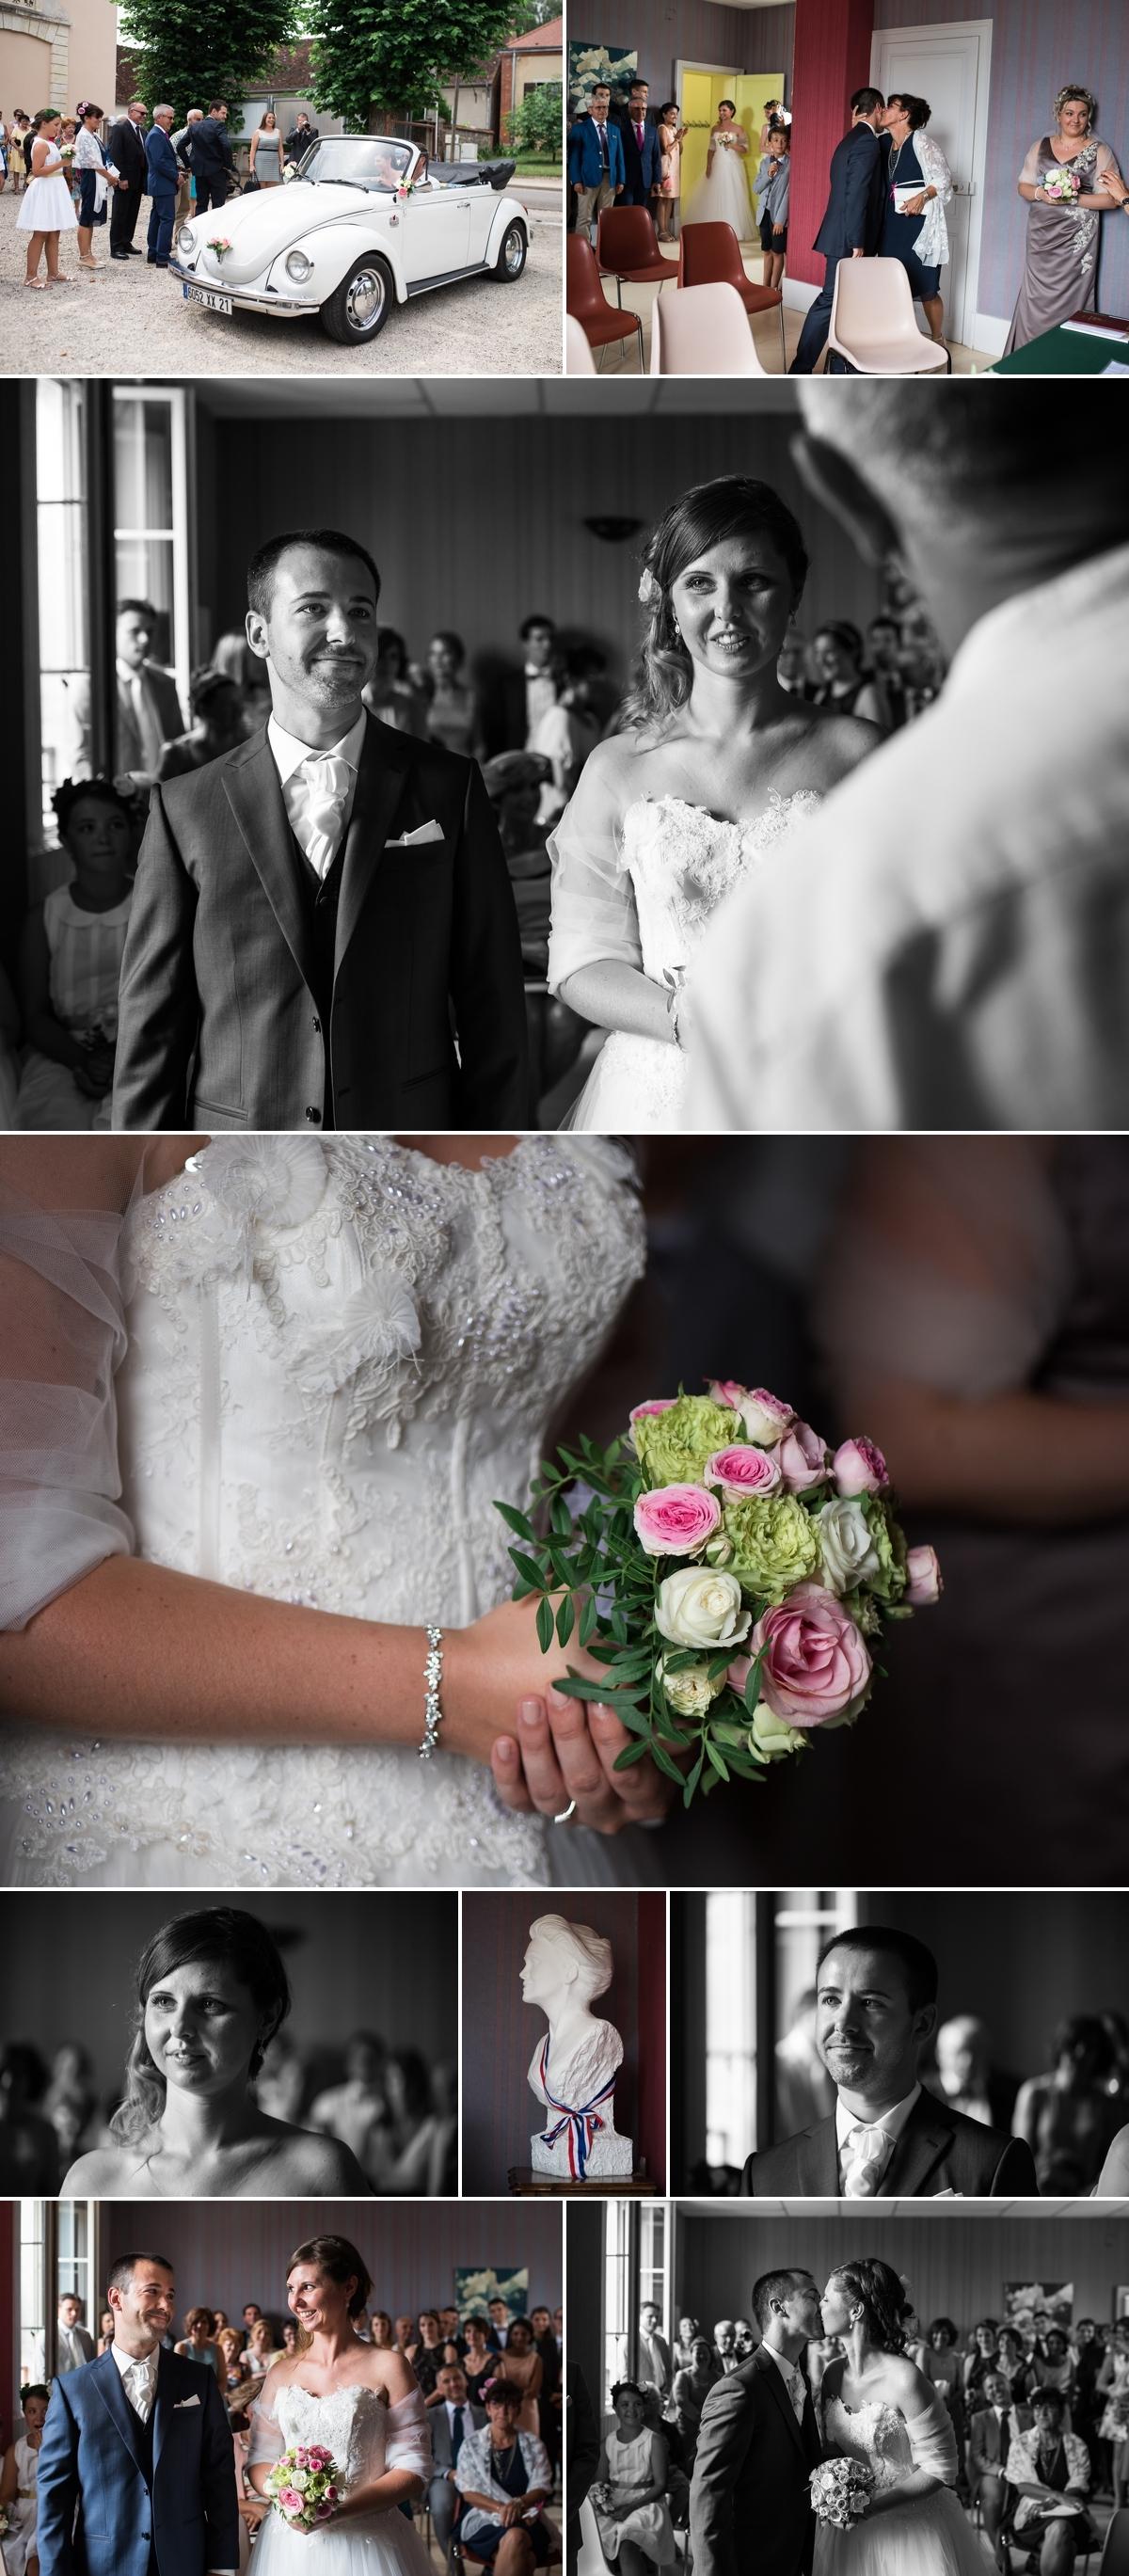 ceremonie-mariage-bourgogne-claudine-nicolas